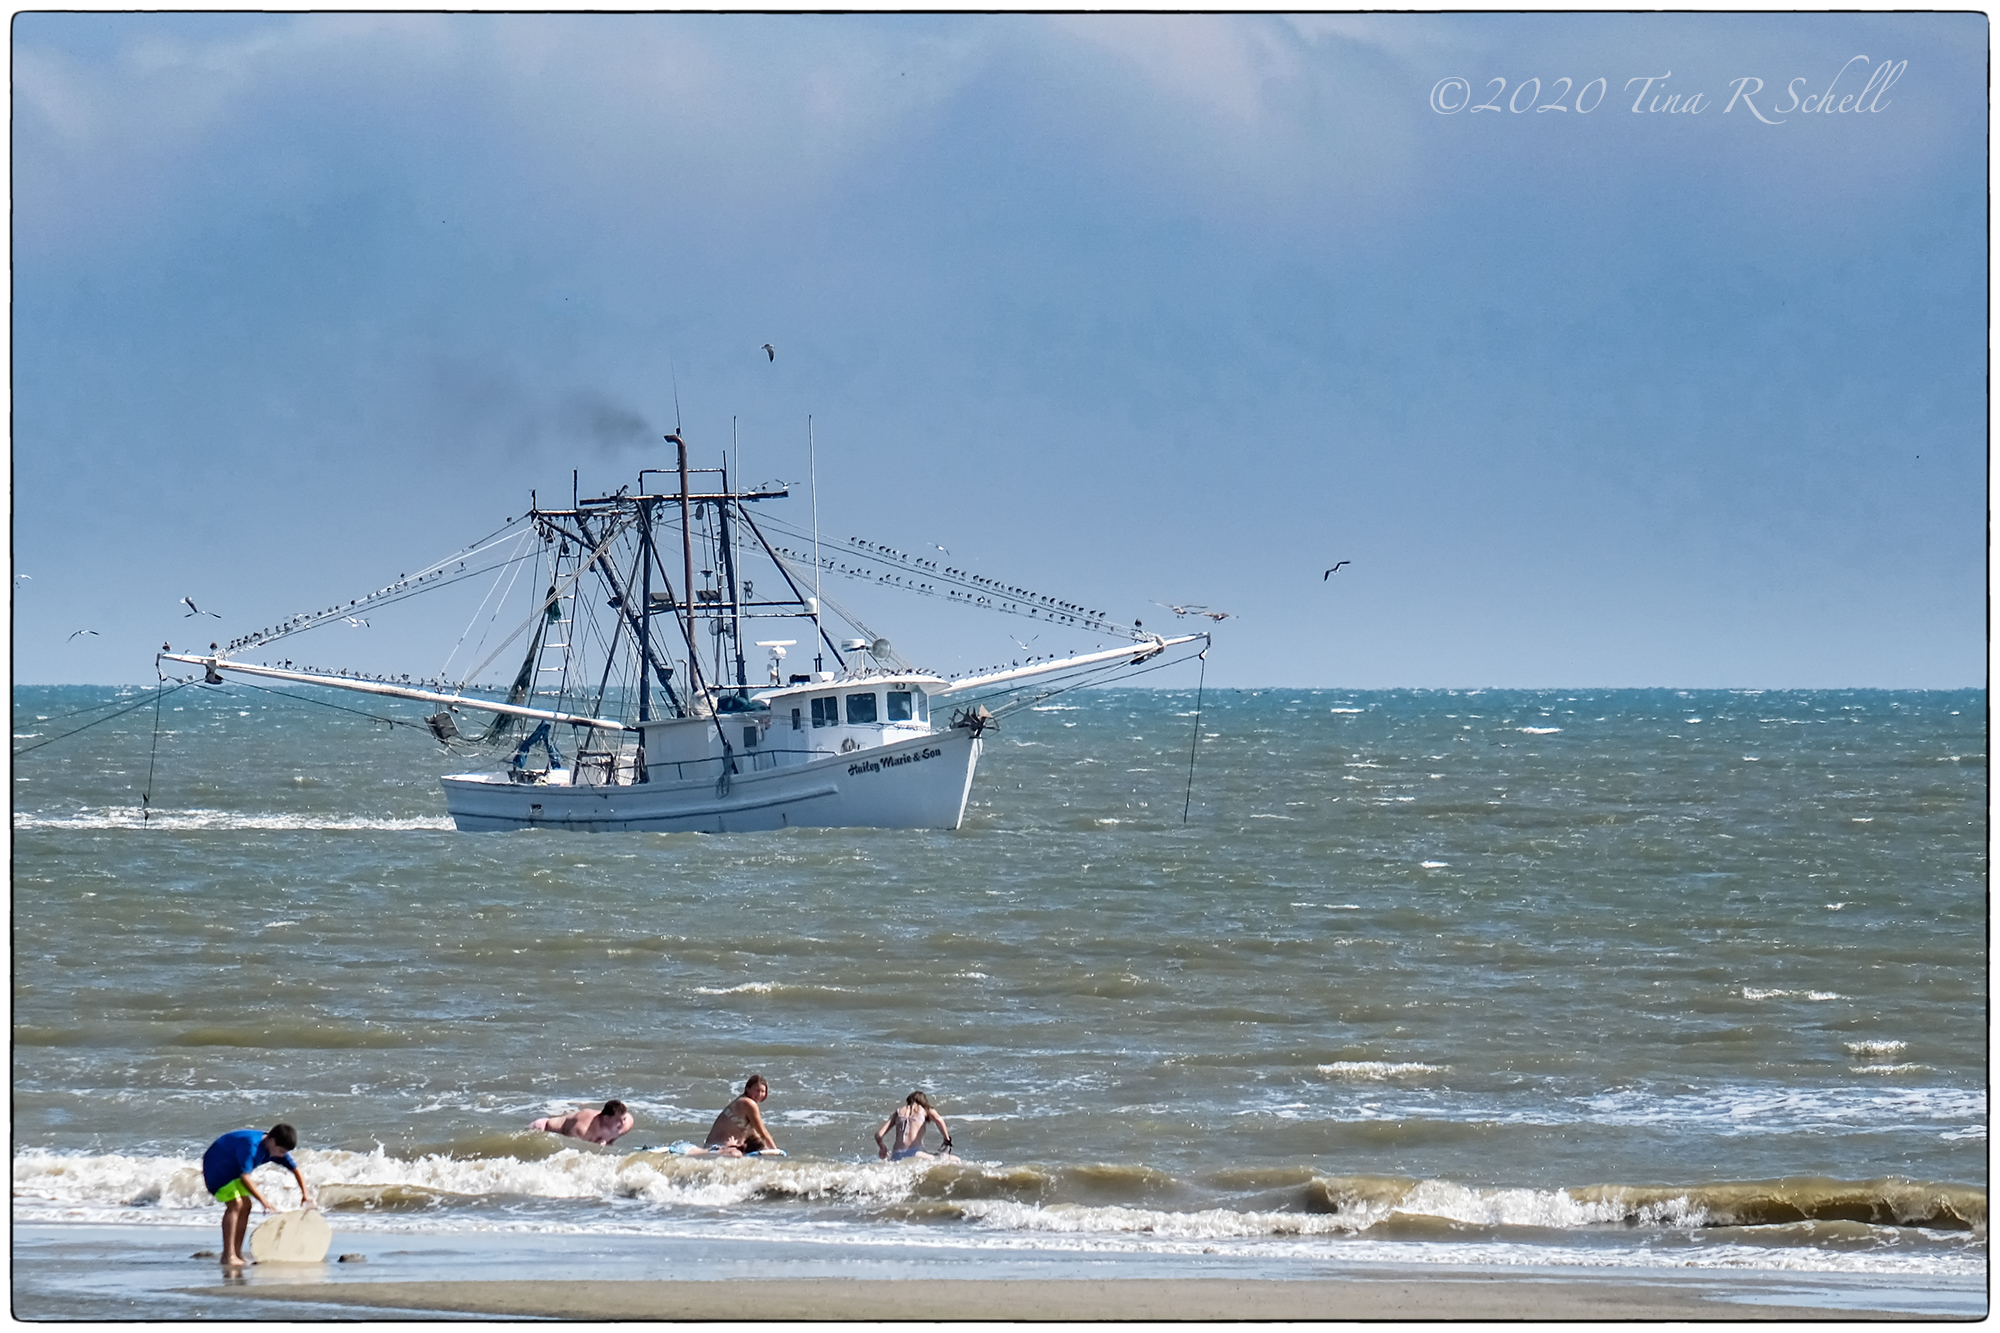 shrimp boat, ocean, swimmers